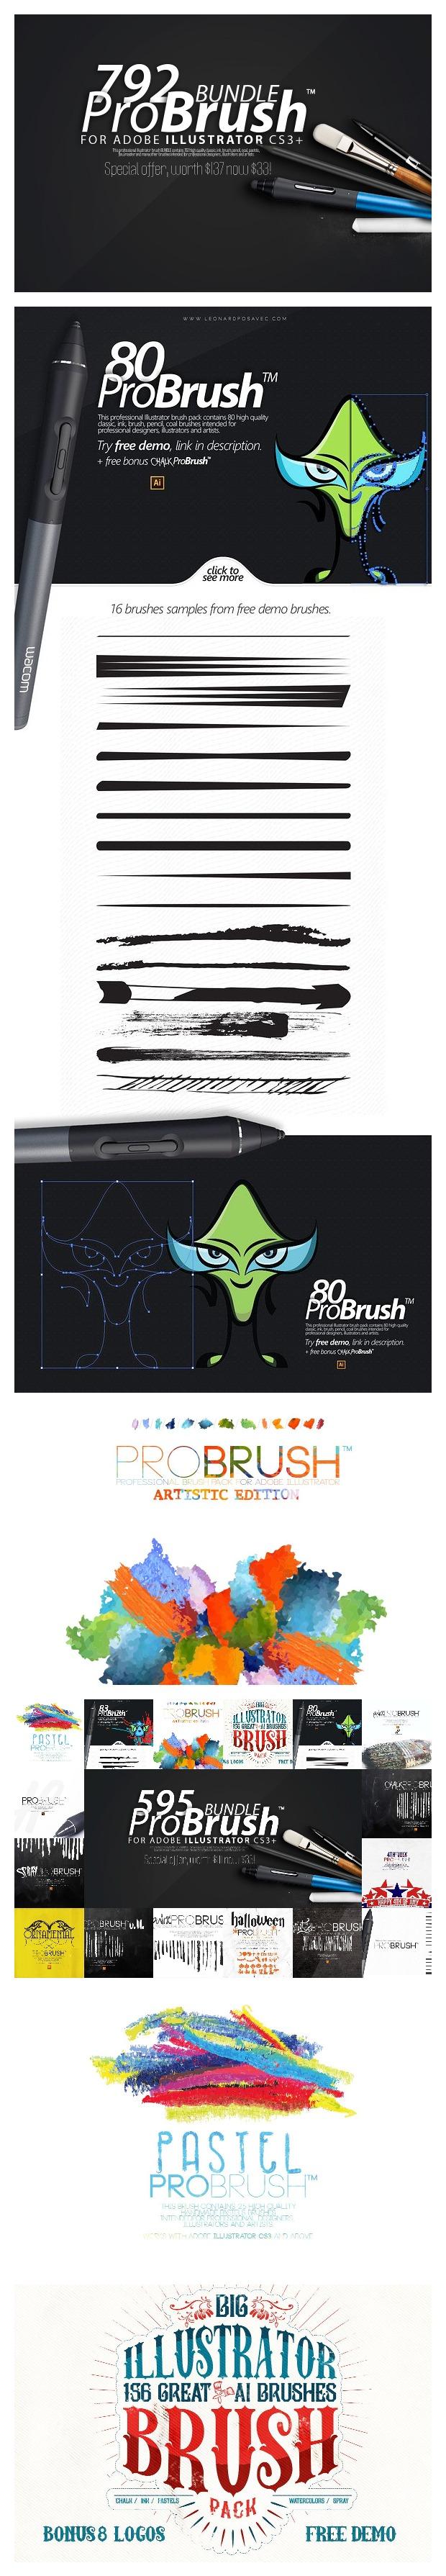 Probrush Bundle